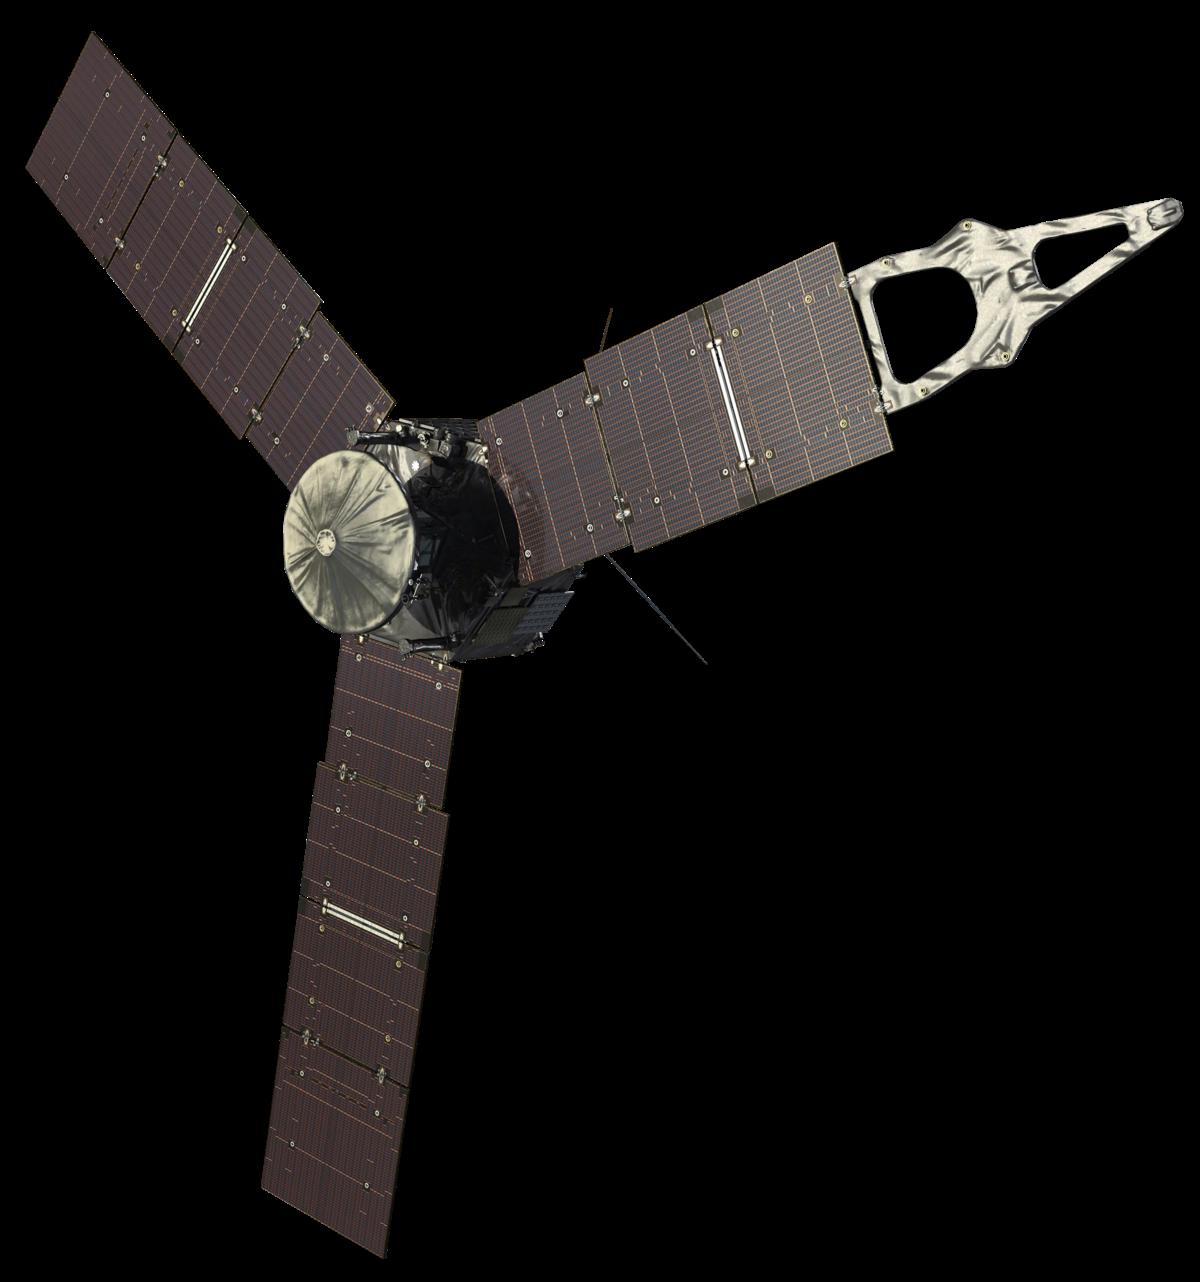 juno spacecraft -#main